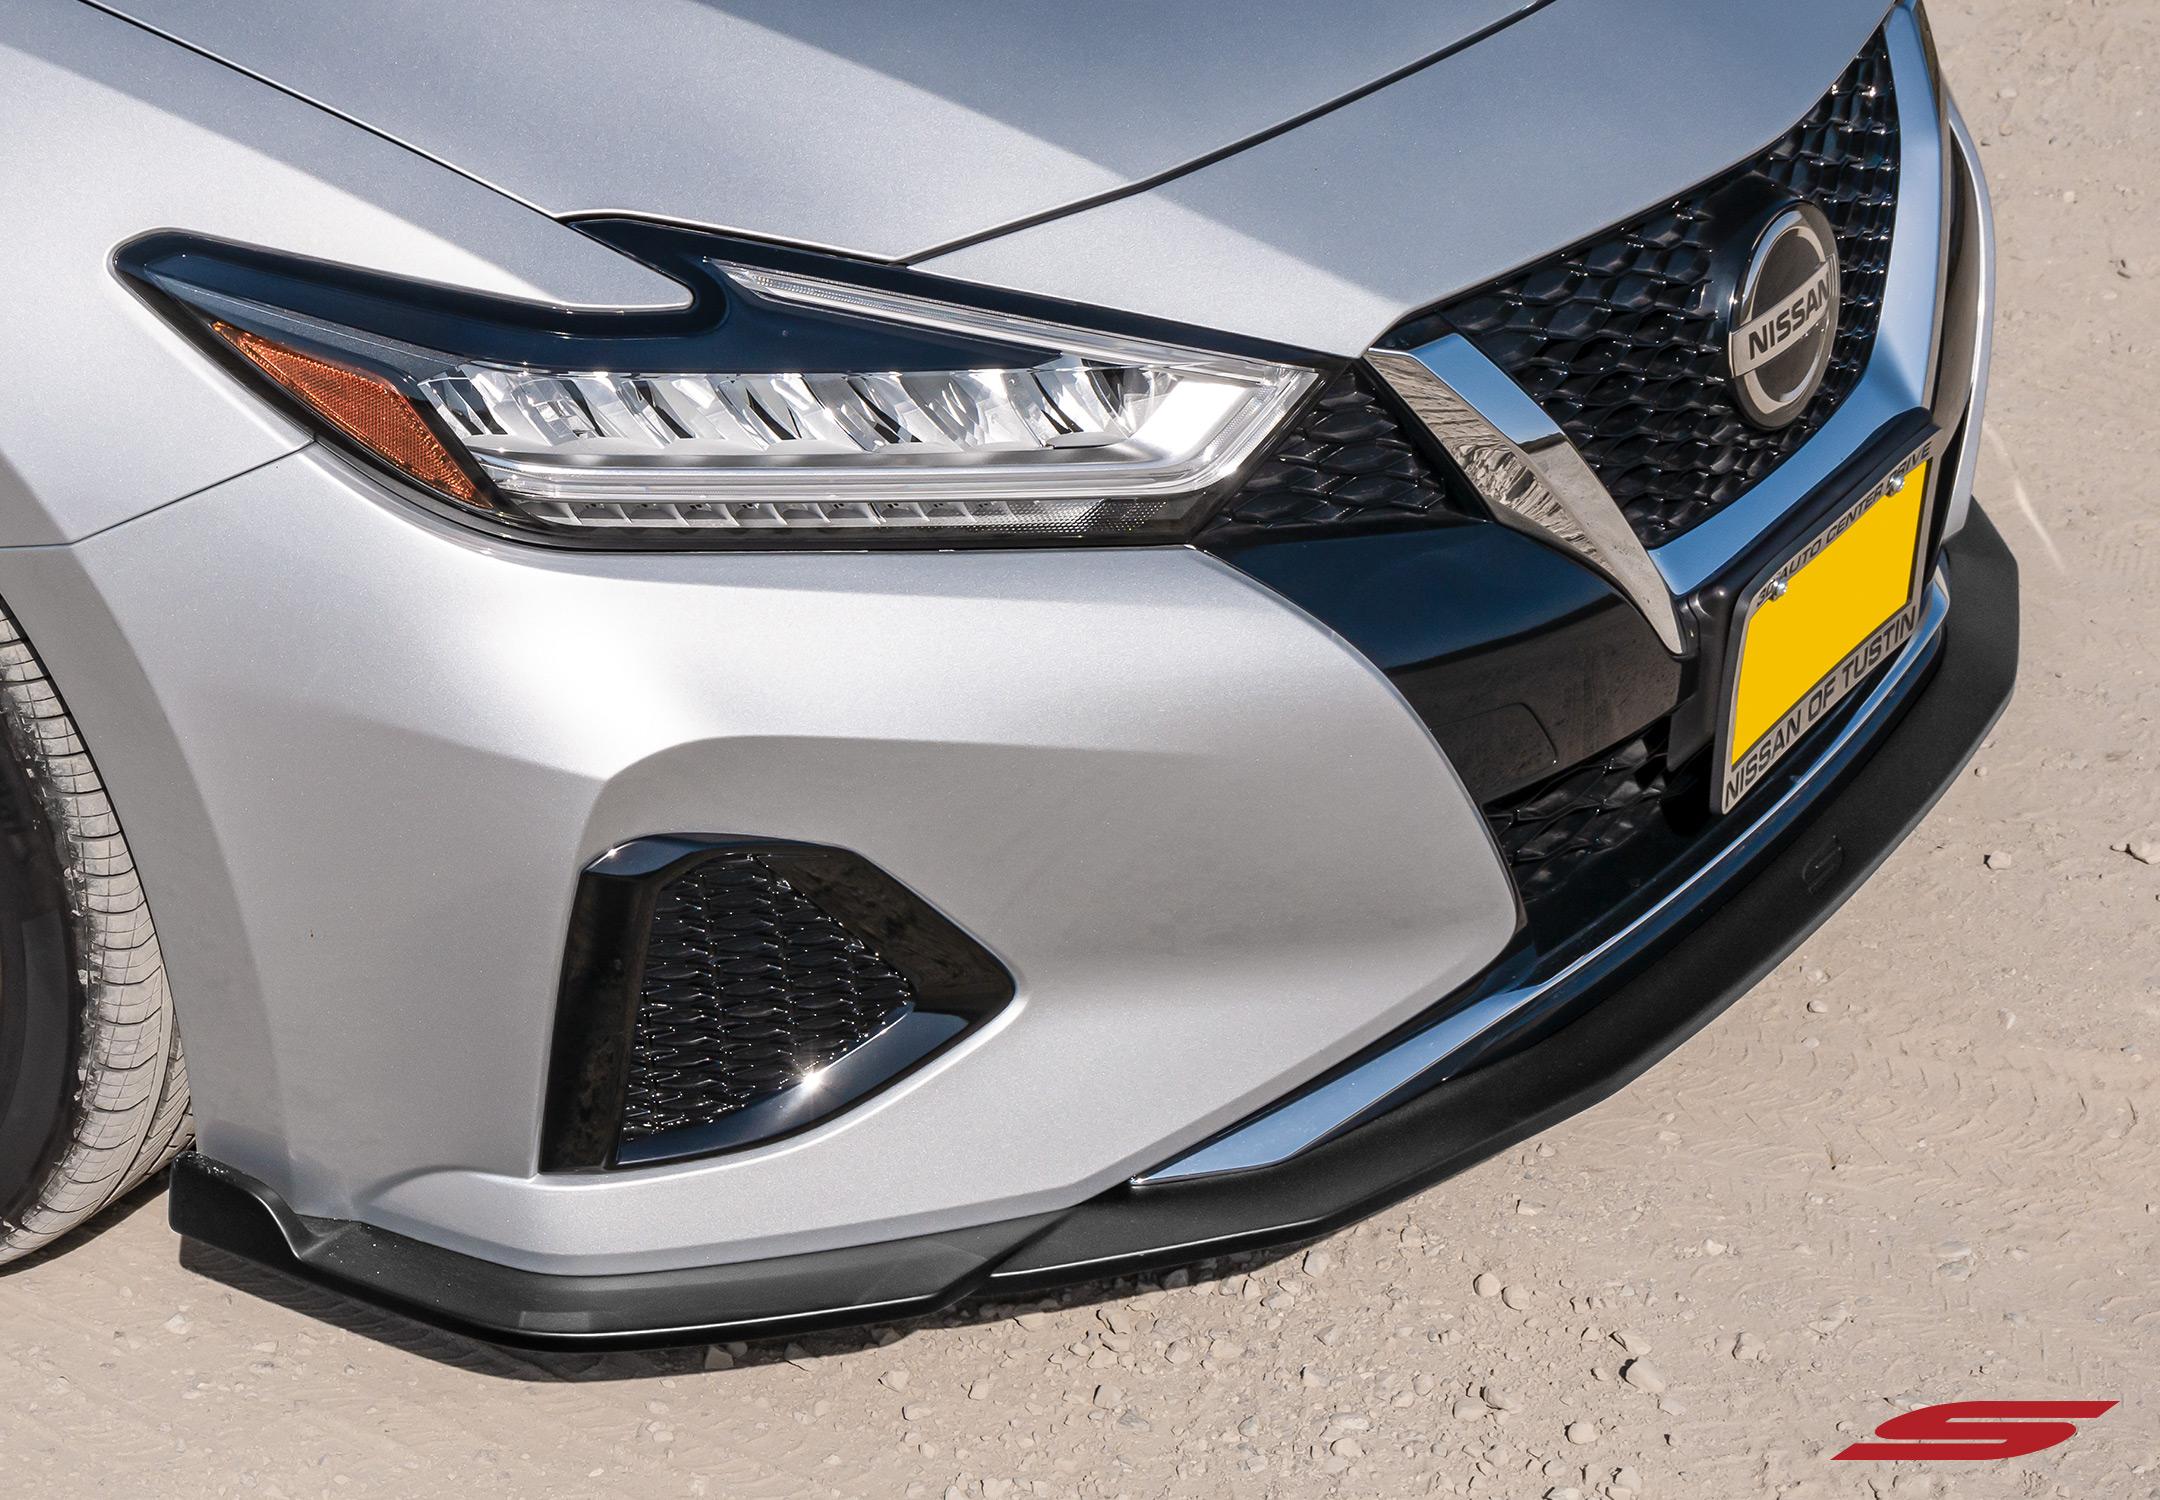 2019 Nissan Maxima STILLEN Front Splitter